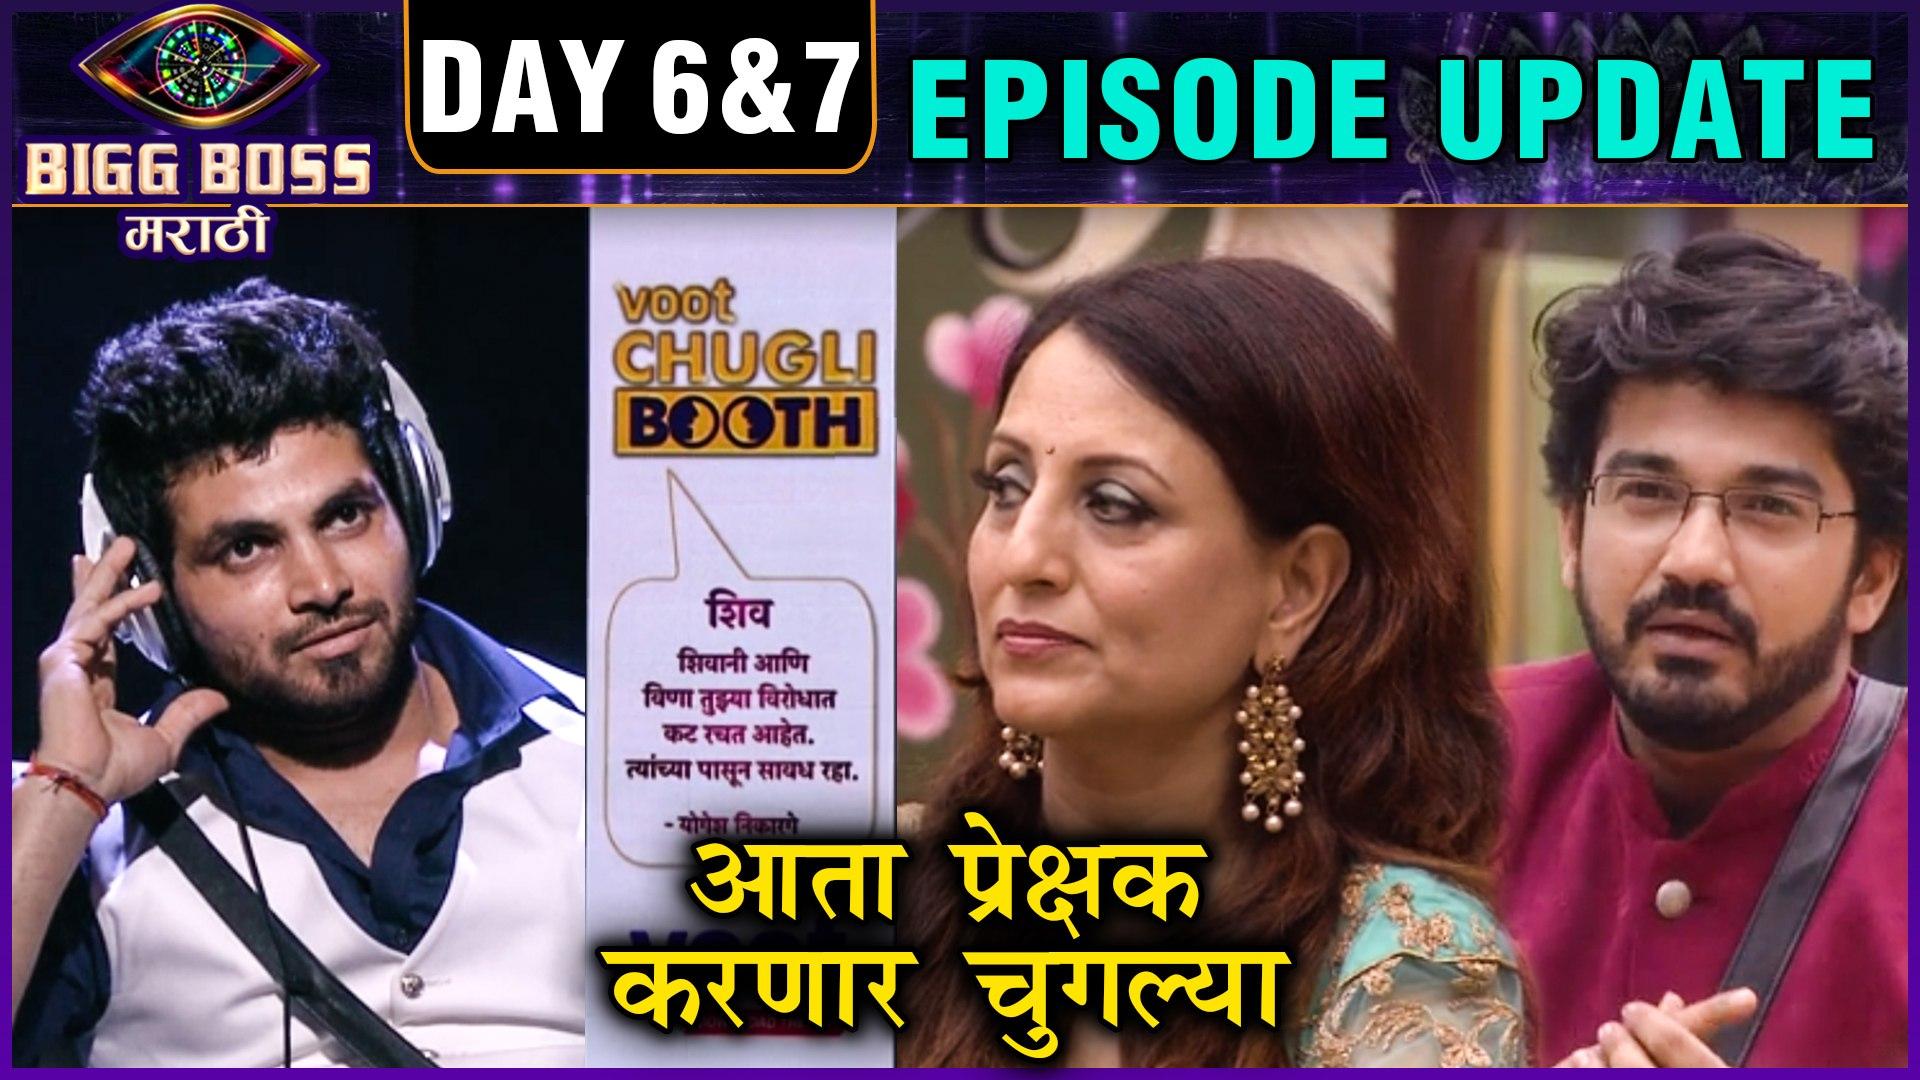 Bigg Boss Marathi 2 | आता प्रेक्षक करणार चुगल्या | Day 6 & 7 Episode Update